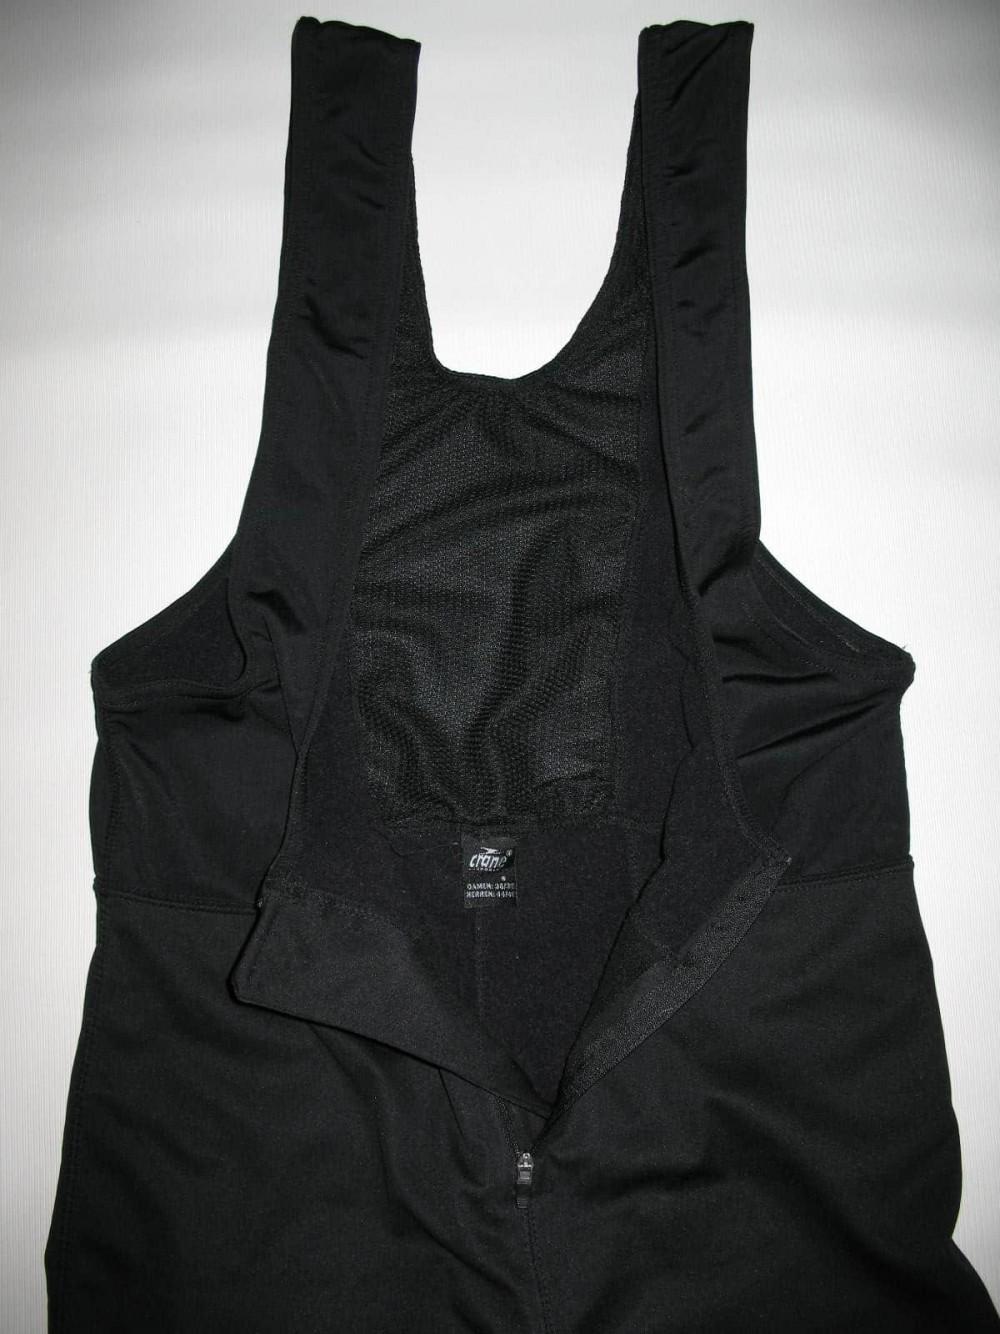 Велобрюки CRANE windstopper bib cycling pants (размер unisex S) - 3